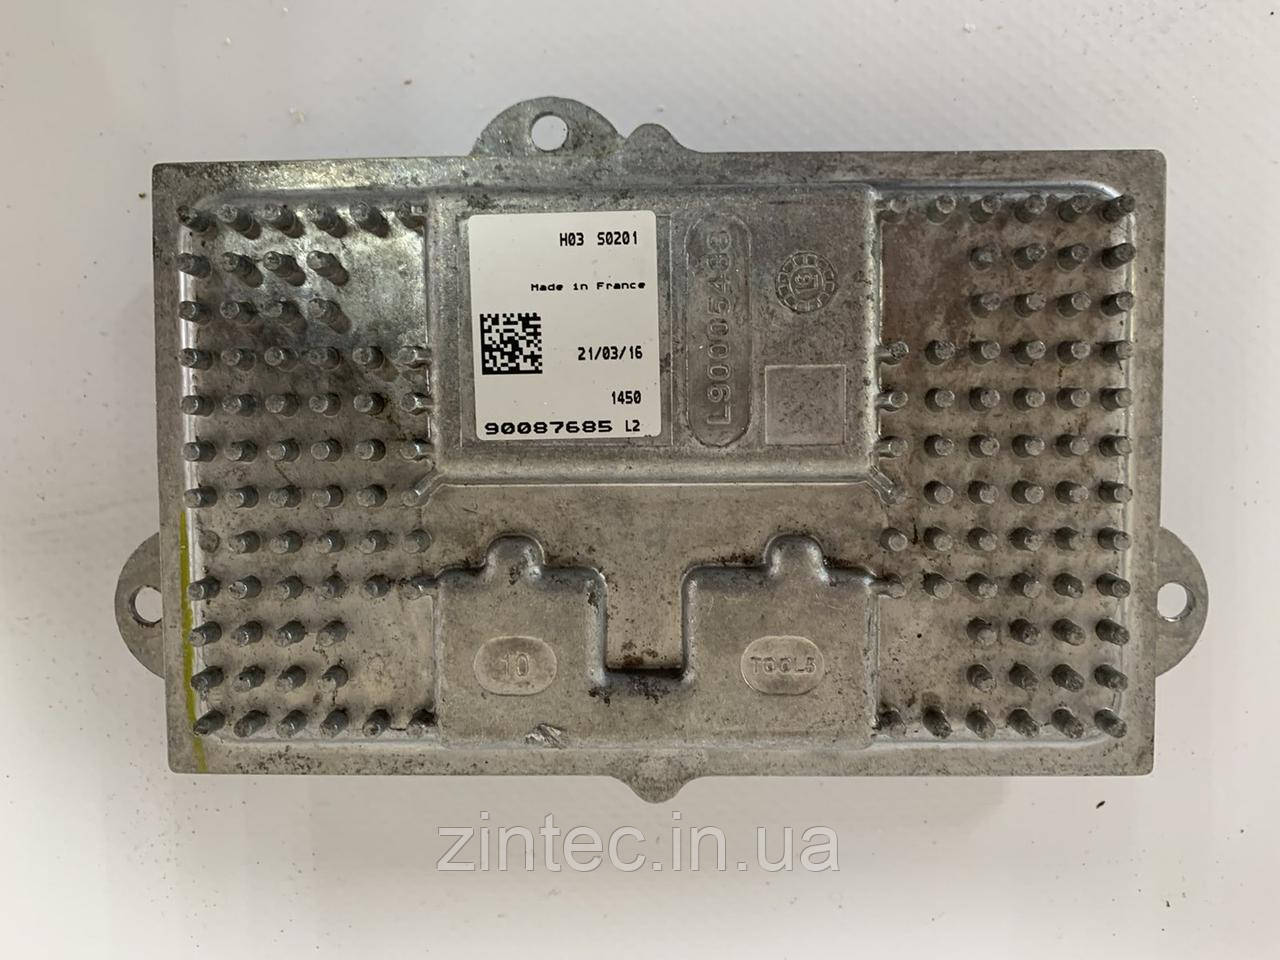 Ford fusion mk5 блок розжига фары 90087685 USA